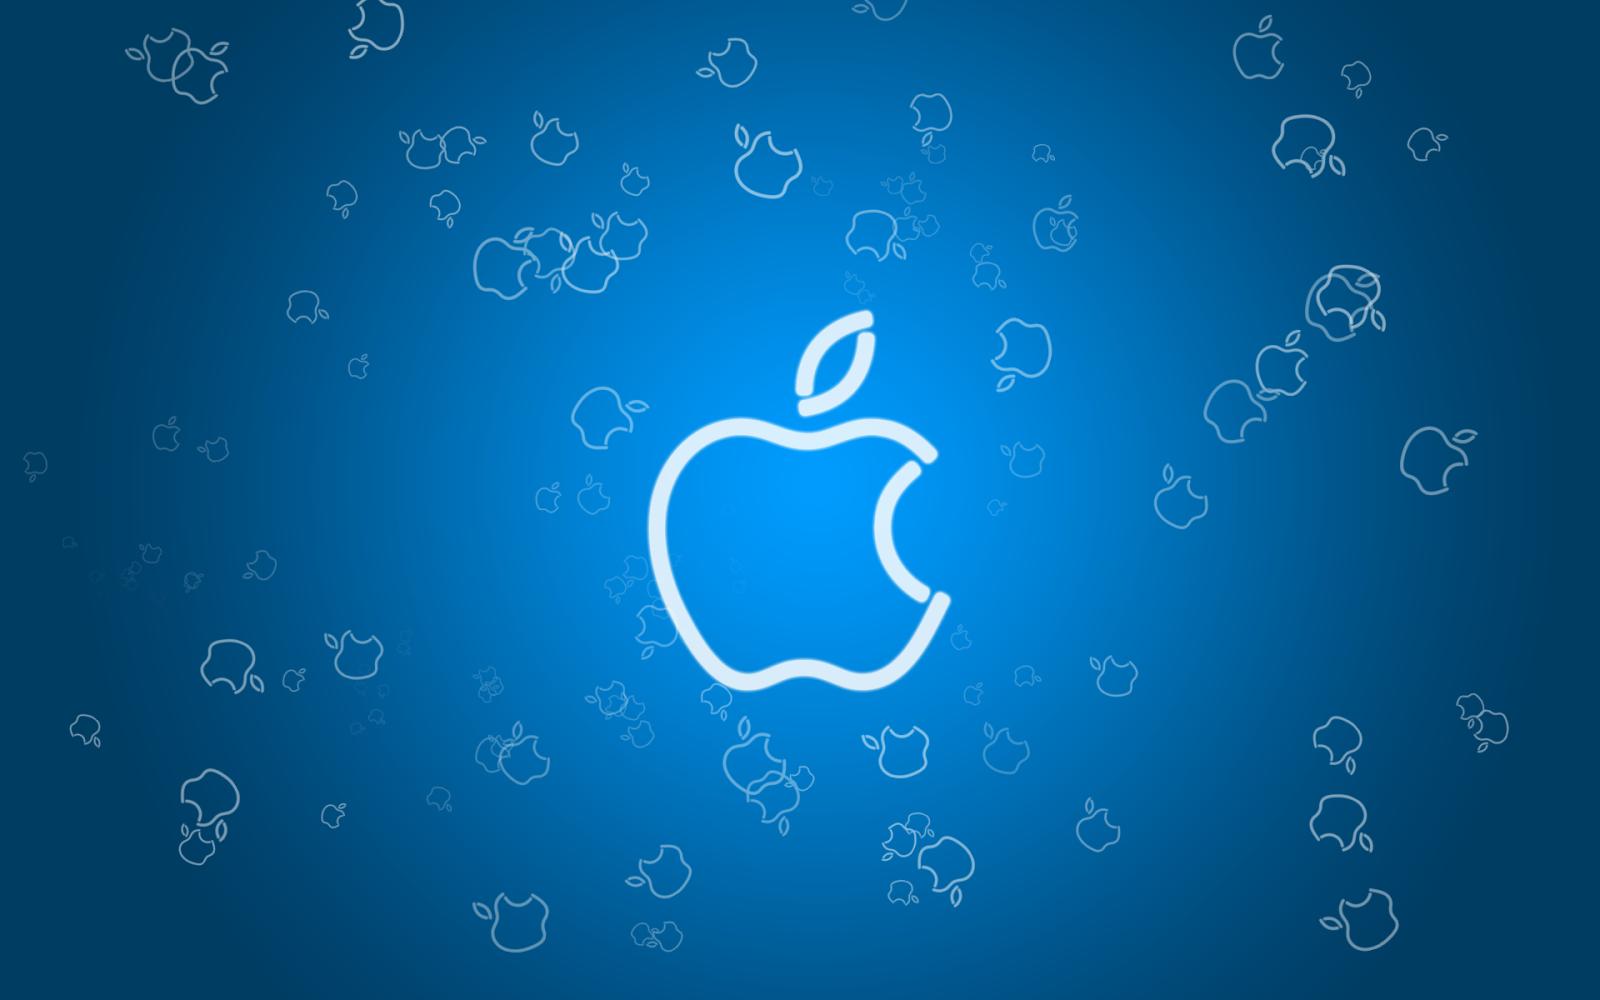 http://3.bp.blogspot.com/_Gq1jO6iuU2U/TSpavNDpkZI/AAAAAAAAHYo/rpSIDvCWp6I/s1600/Apple_flakes_blue_hd_wallpaper.png